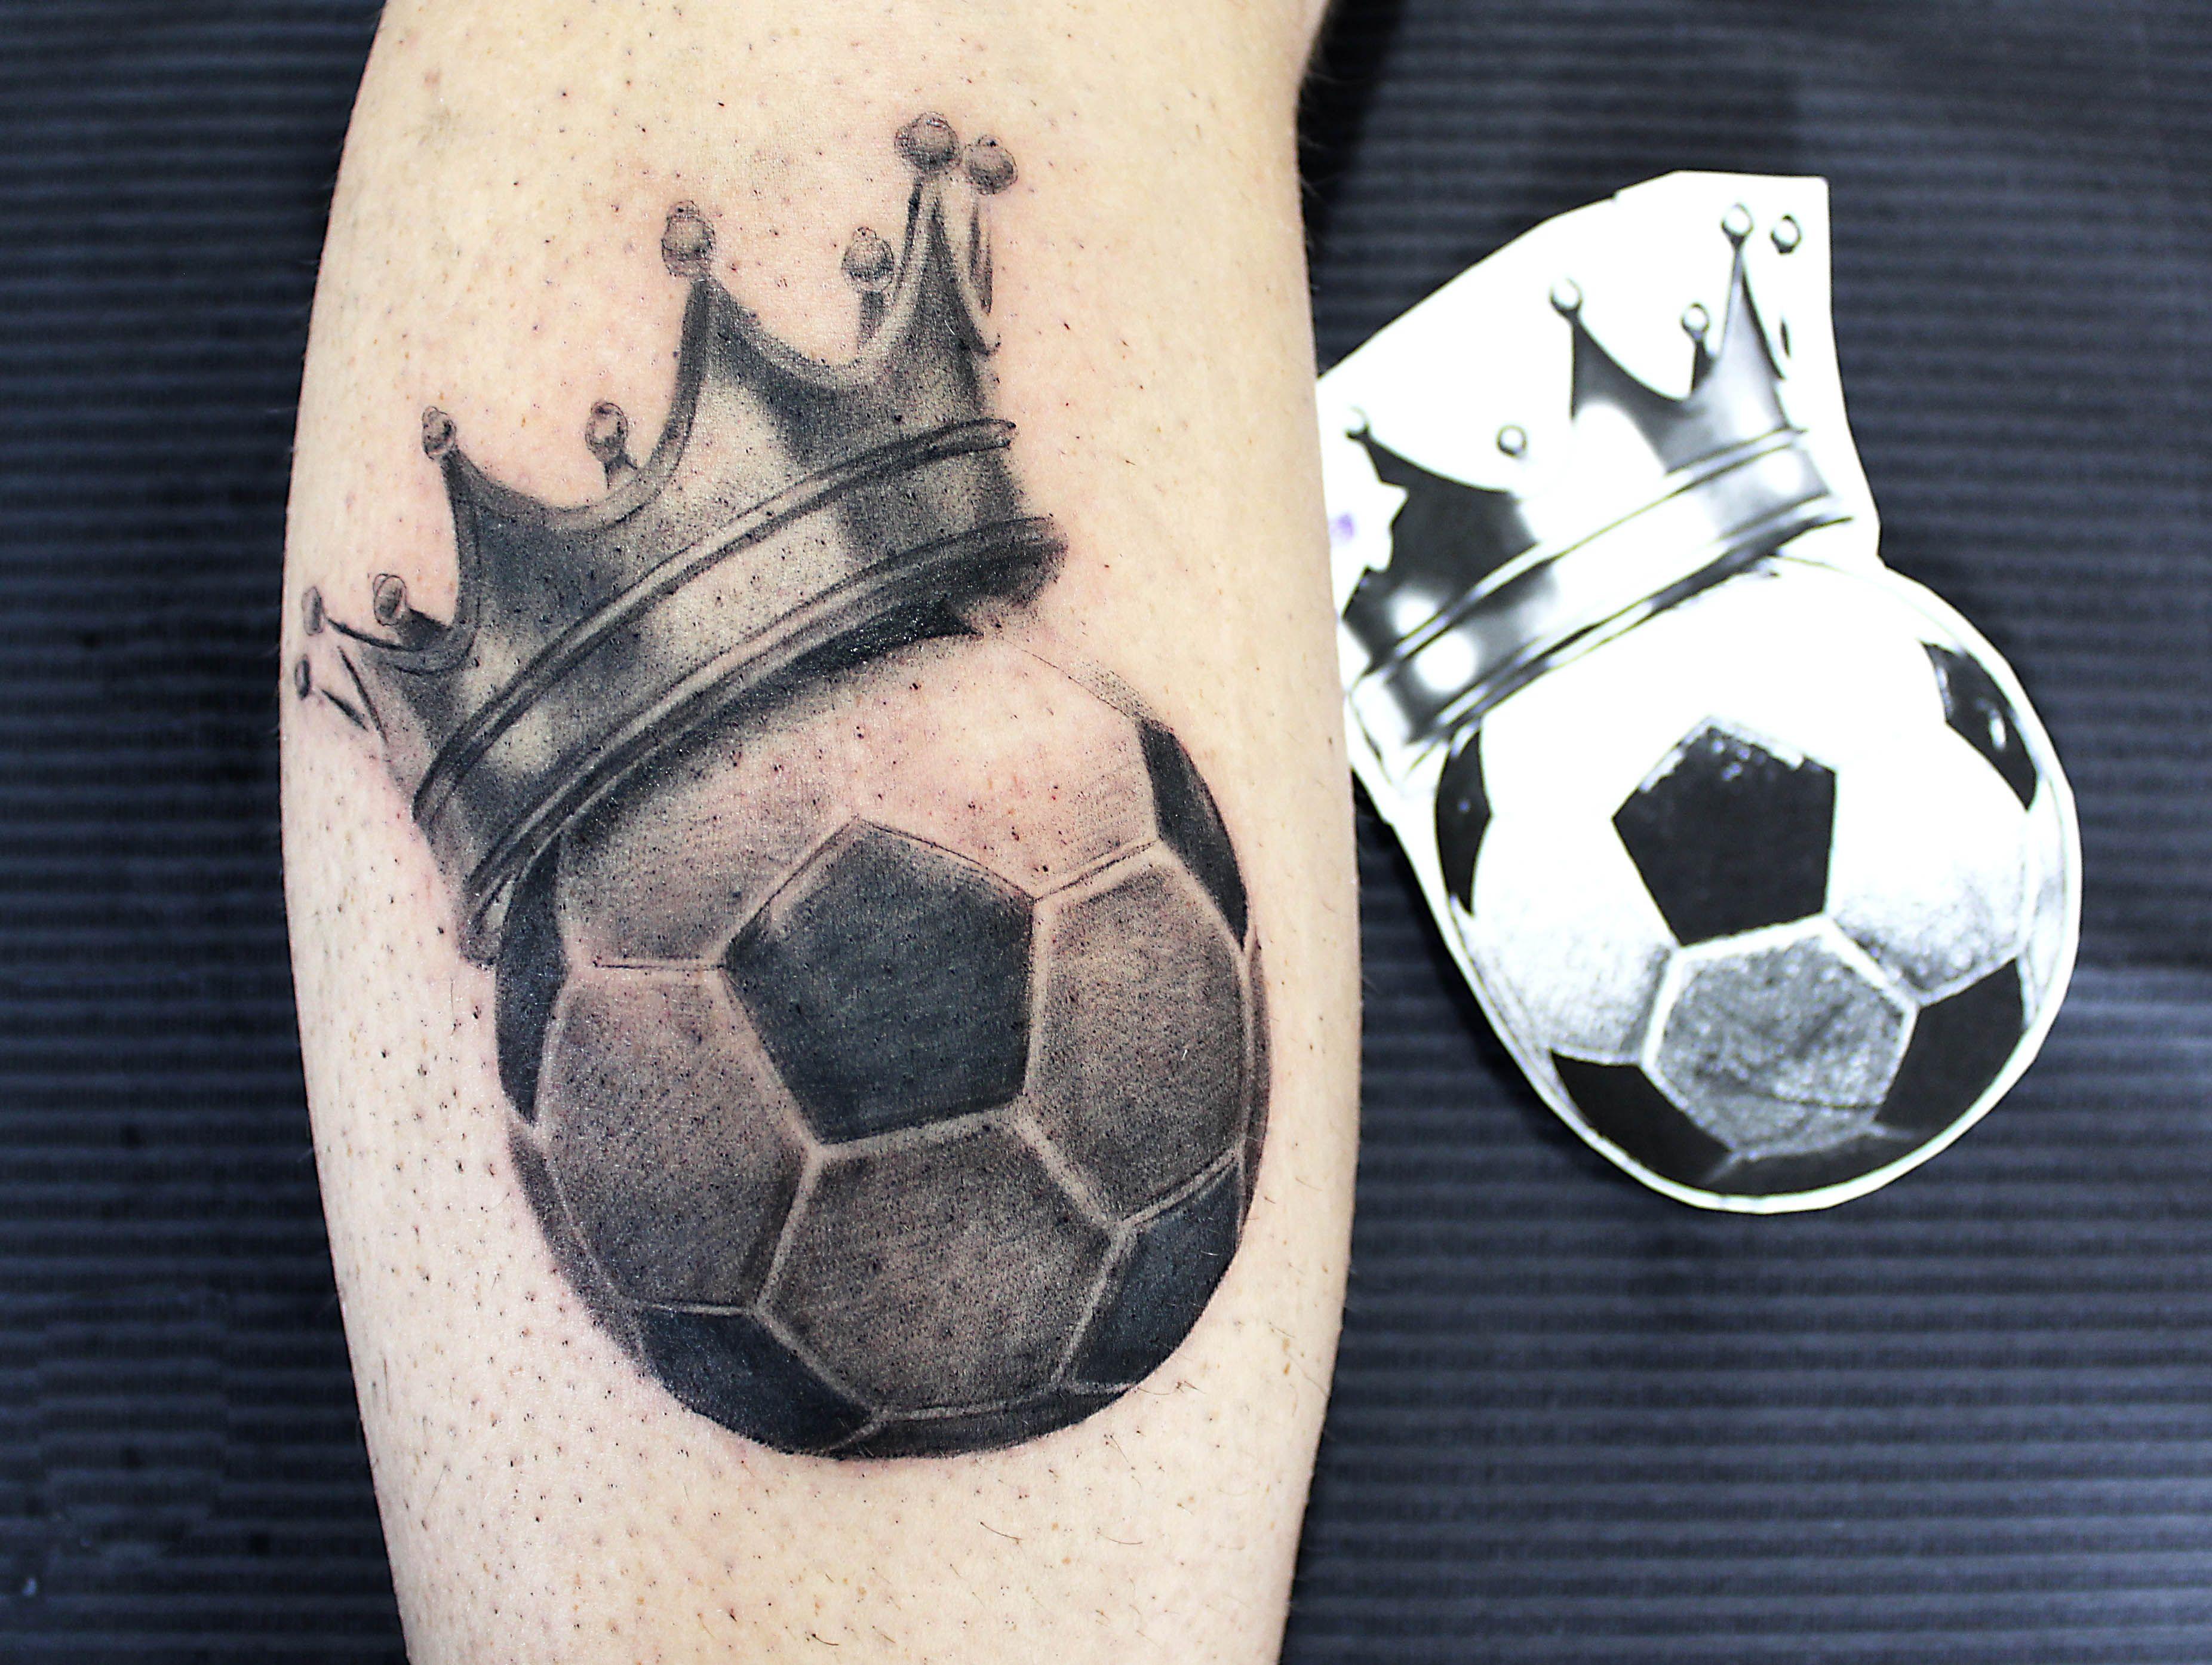 Crown And Soccer Ball Tattoo Tatuagem De Futebol Tatuagem De Texto Tatuagem